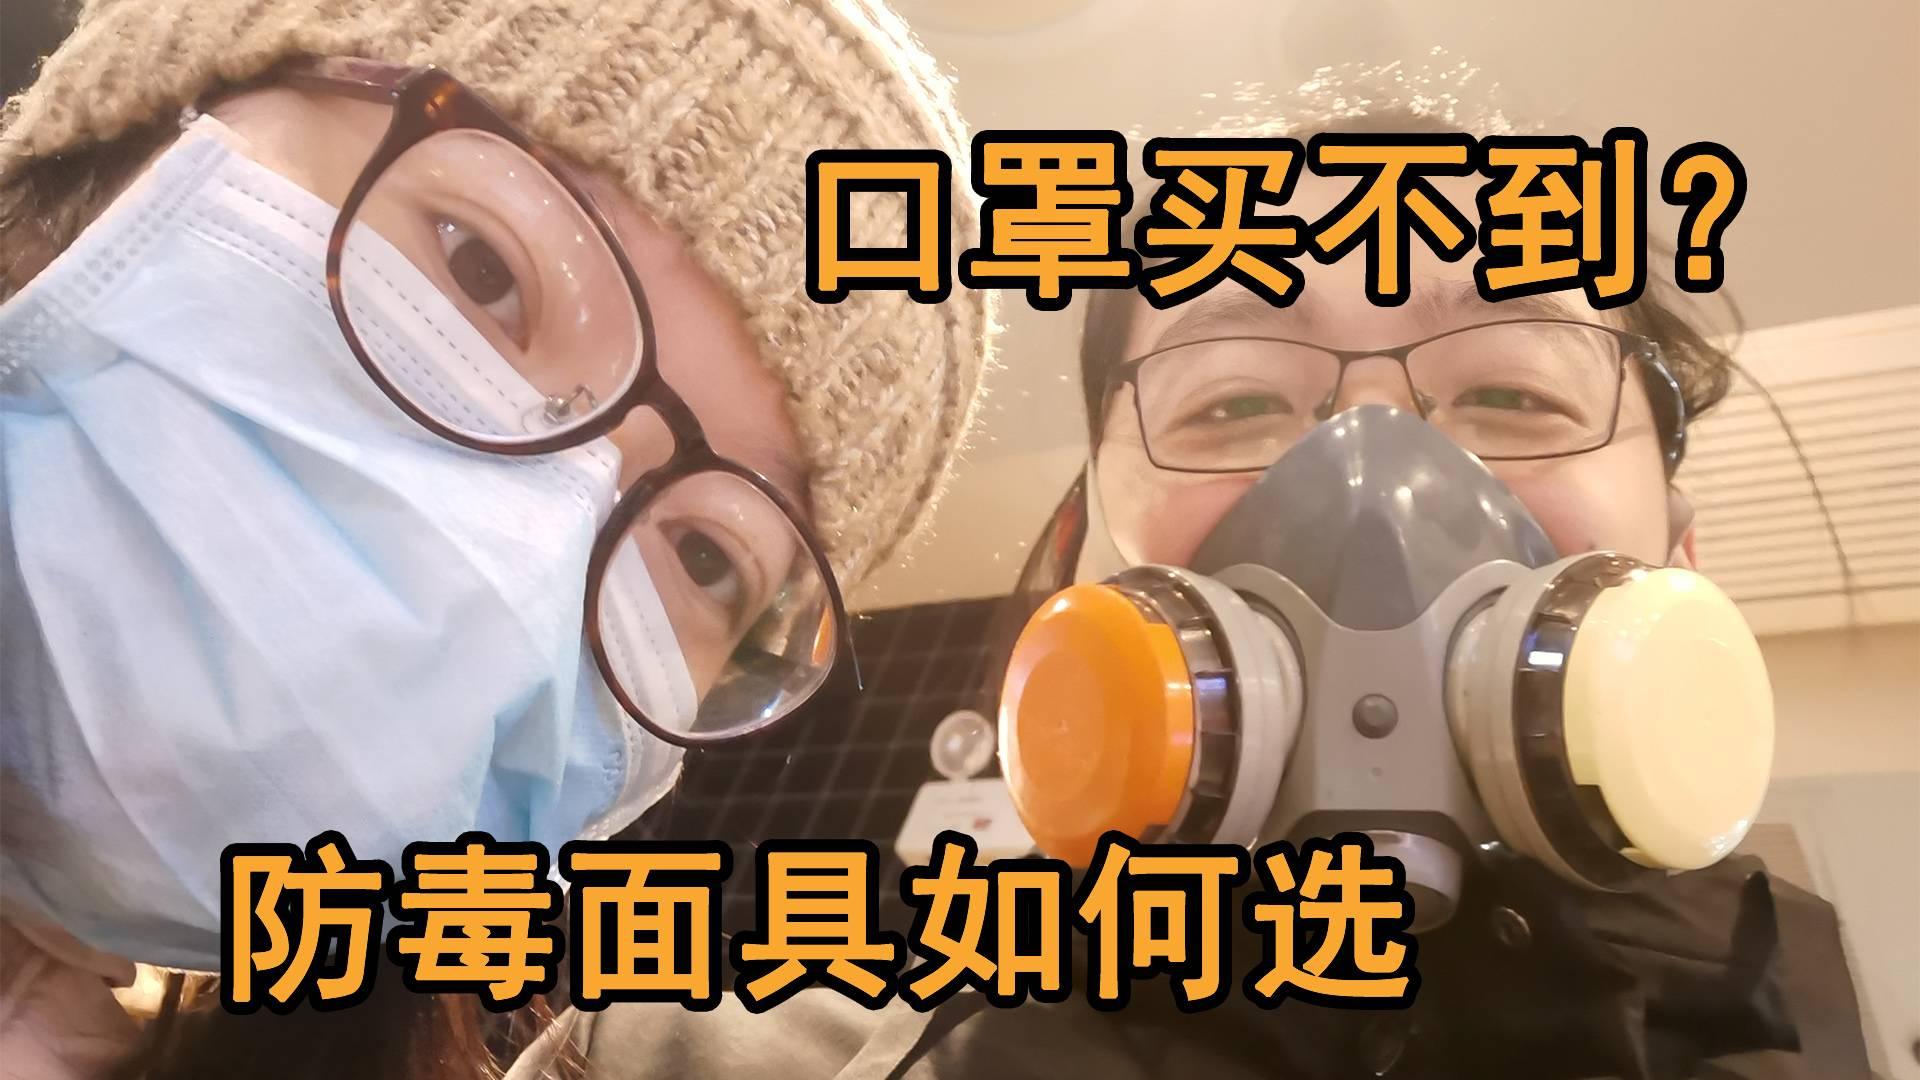 N95的代替品?防毒面具重度用户教你如何选择(使用防毒面具超过五年)我的日常打铁装备XD